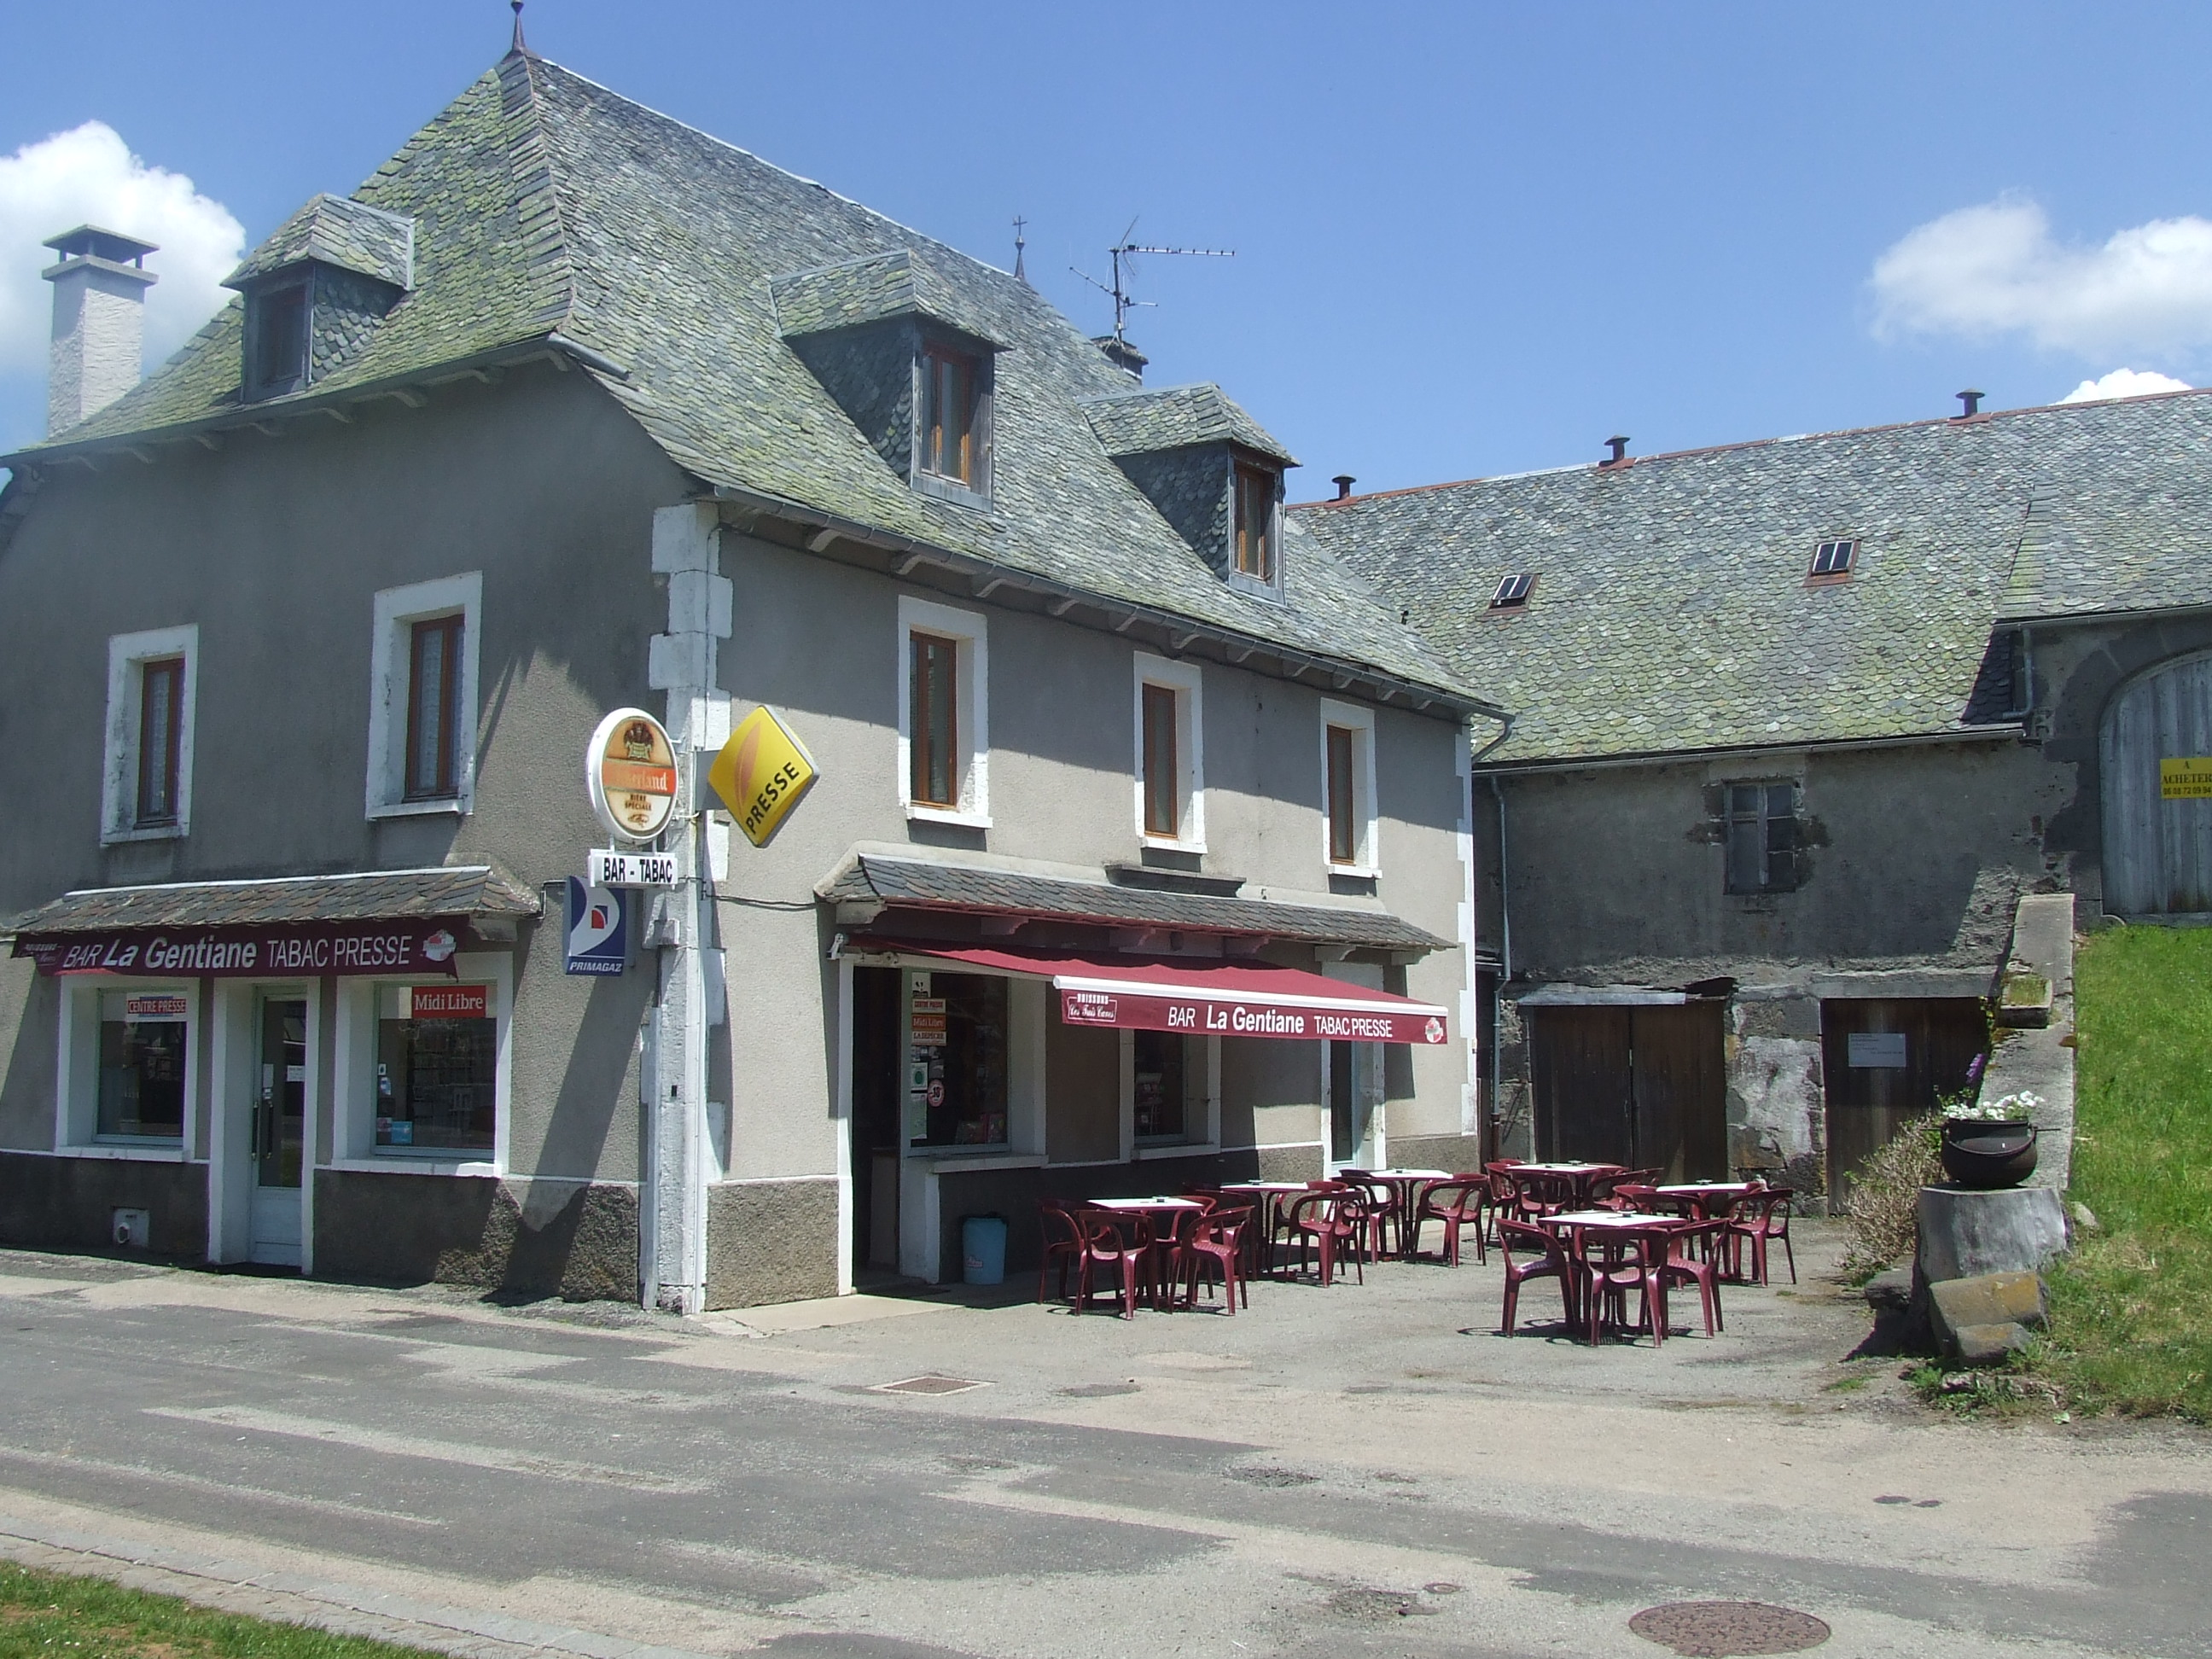 Bar tabac restaurant